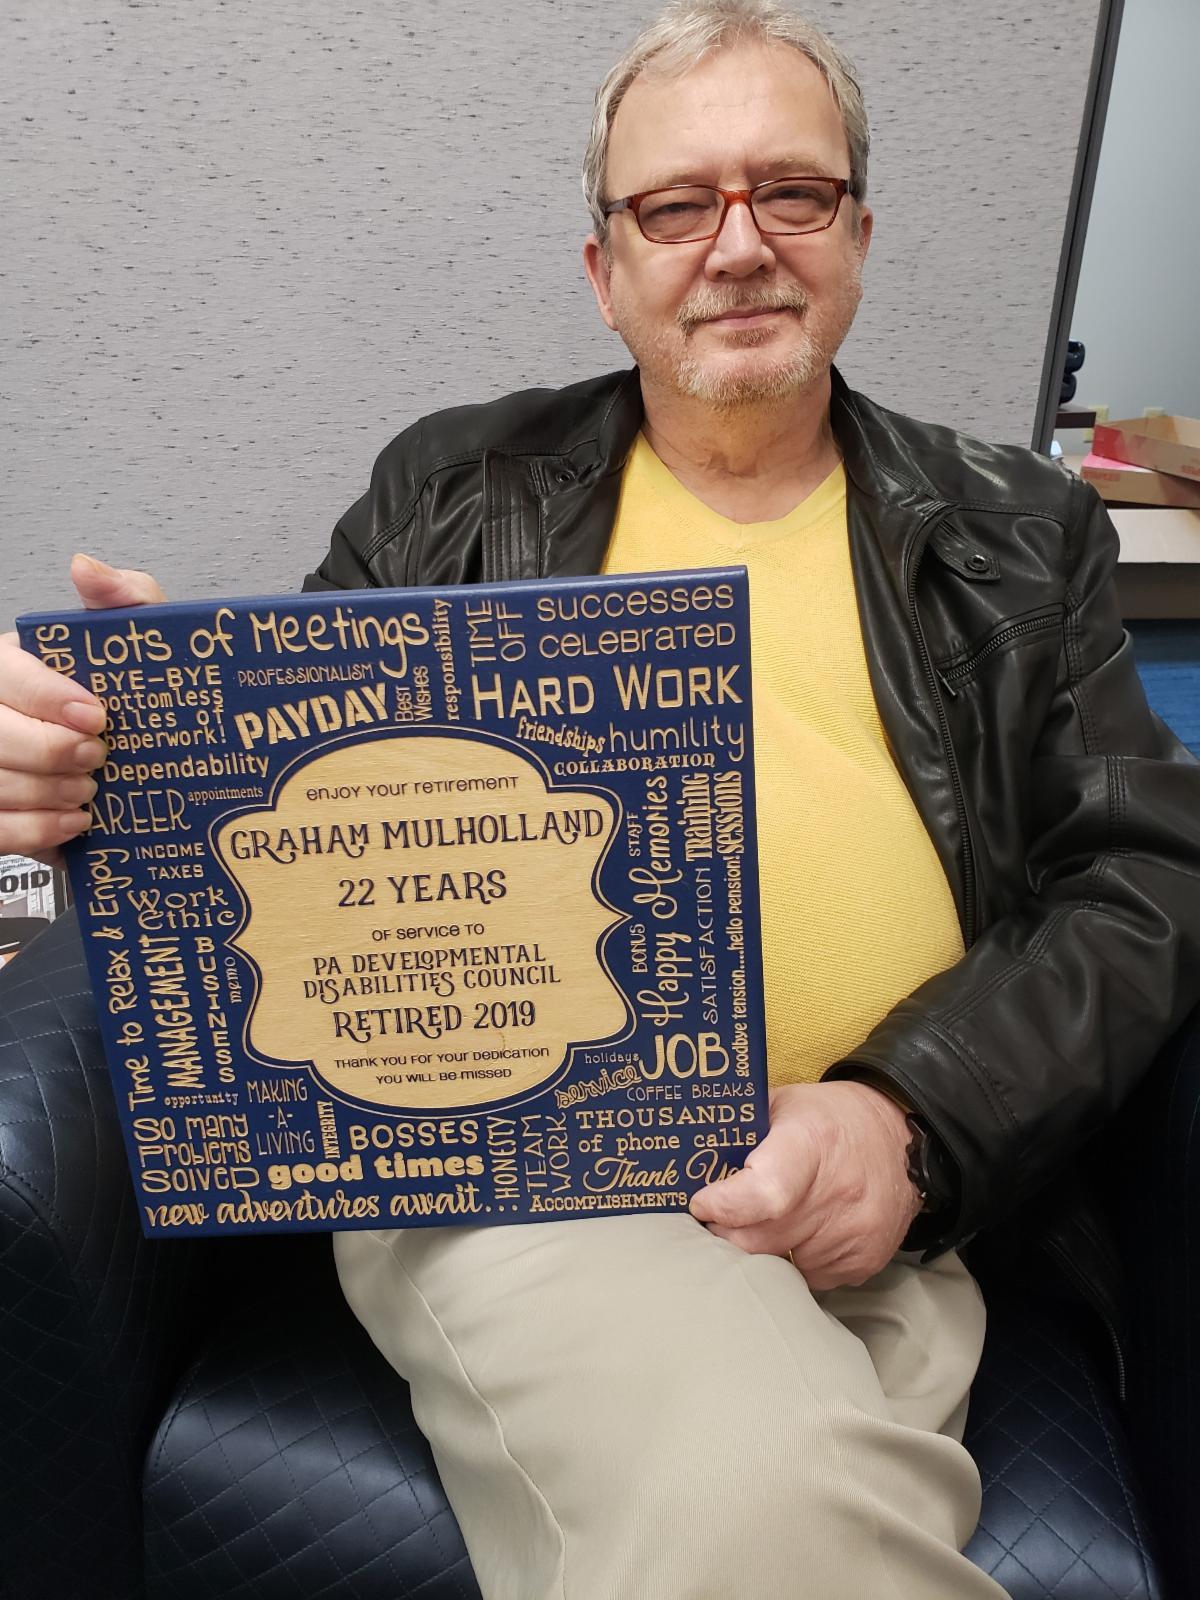 Graham holding plaque